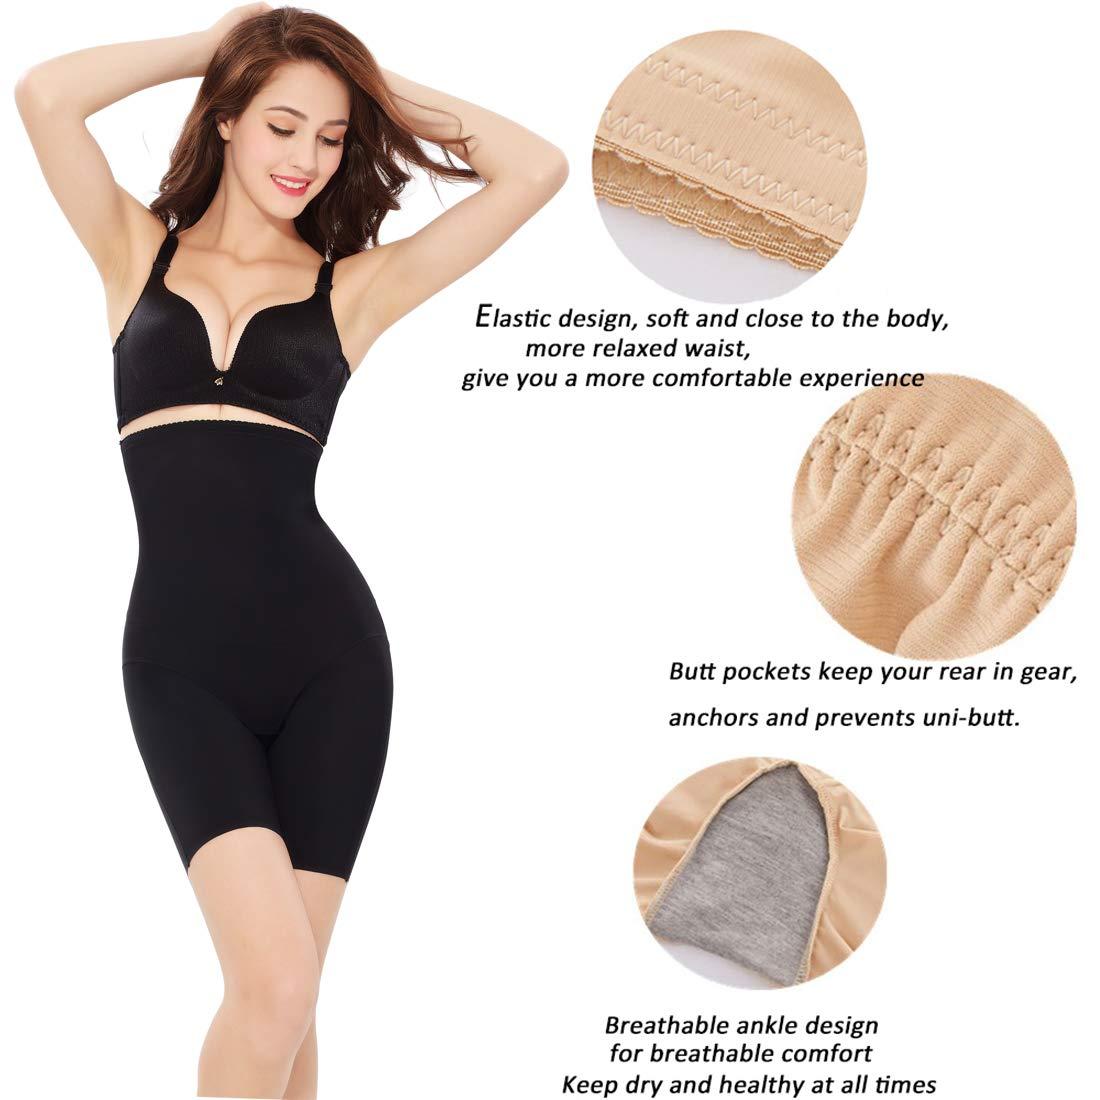 Leotruny Women Shapewear High Waist Seamless Tummy Control Butt Lifter Panty Thing Slimmer